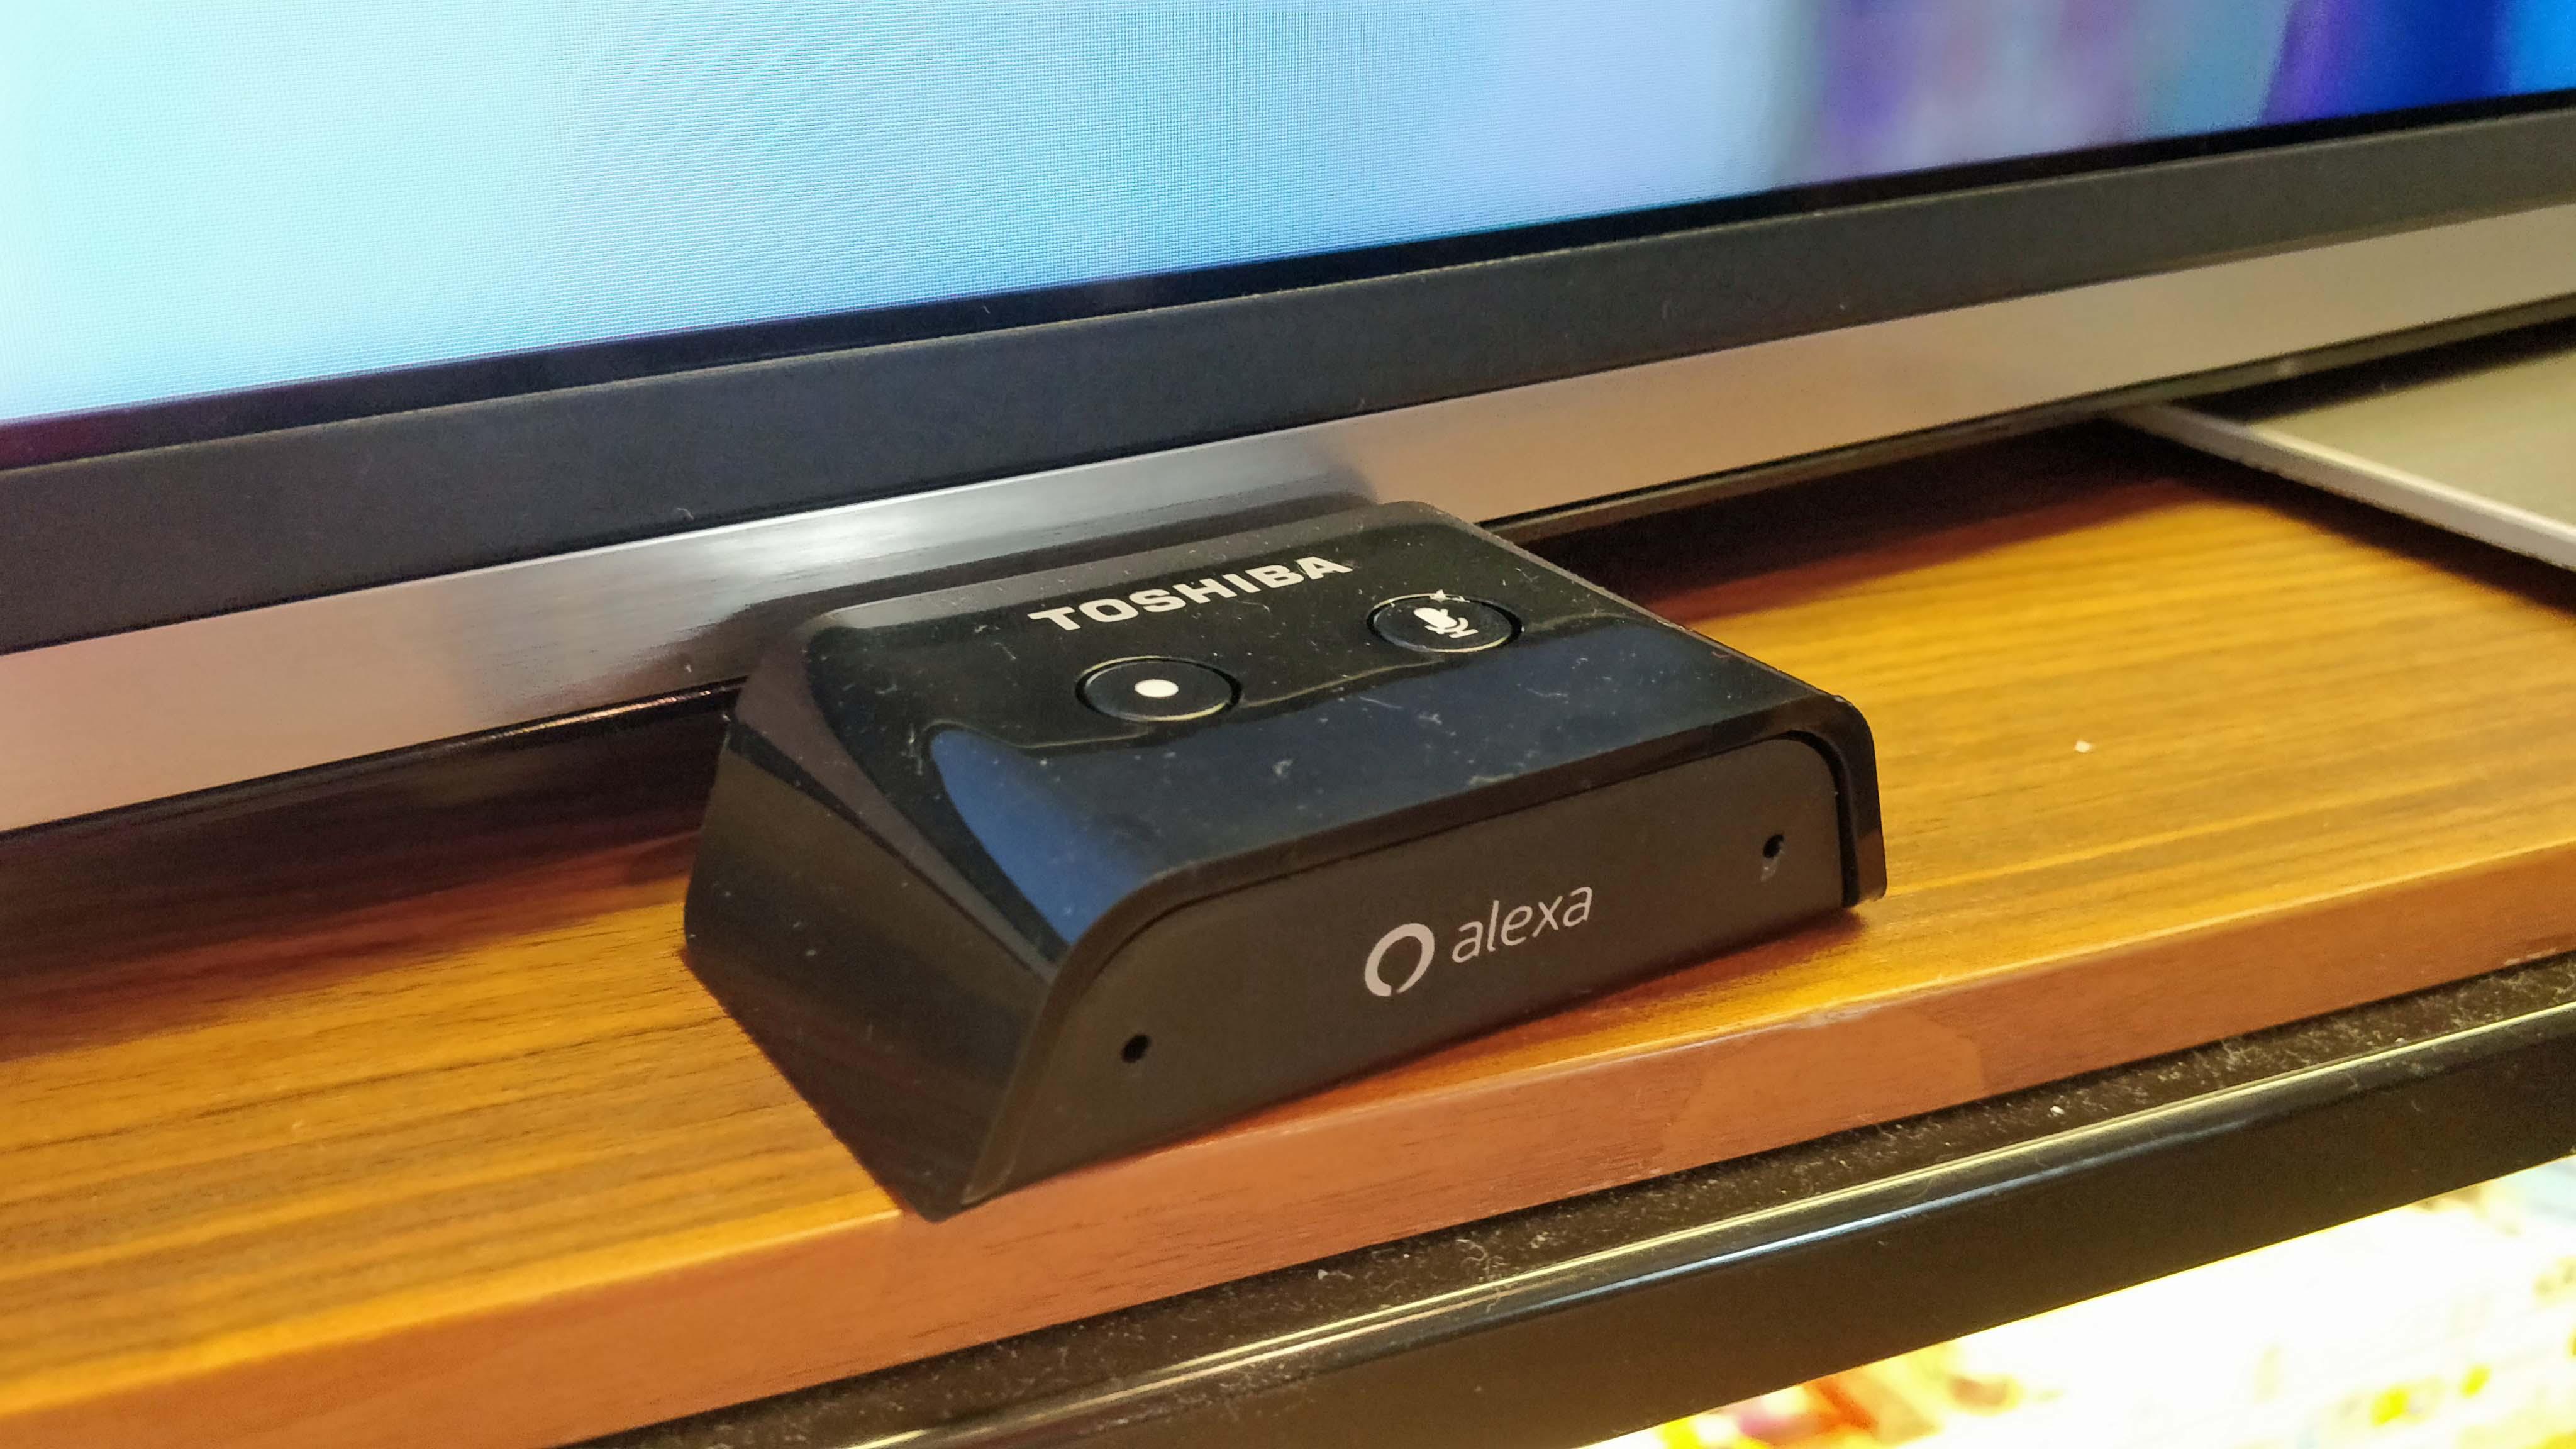 zxD9tE7j63o4dyy5wKez5S - Toshiba's new 4K TVs come with a plug-in Alexa microphone